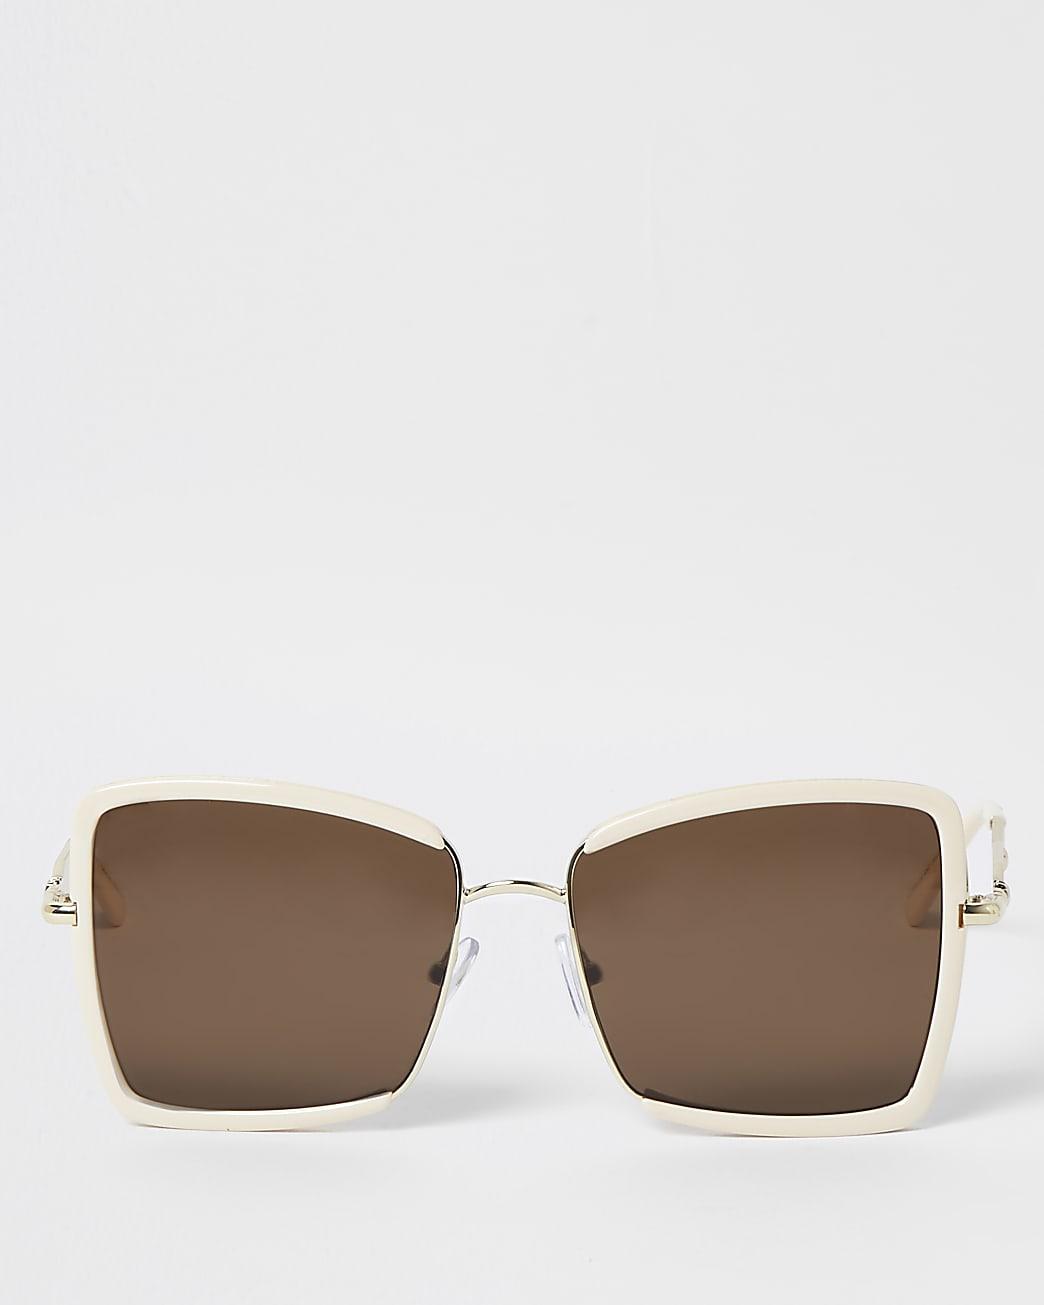 Cream oversized sunglasses